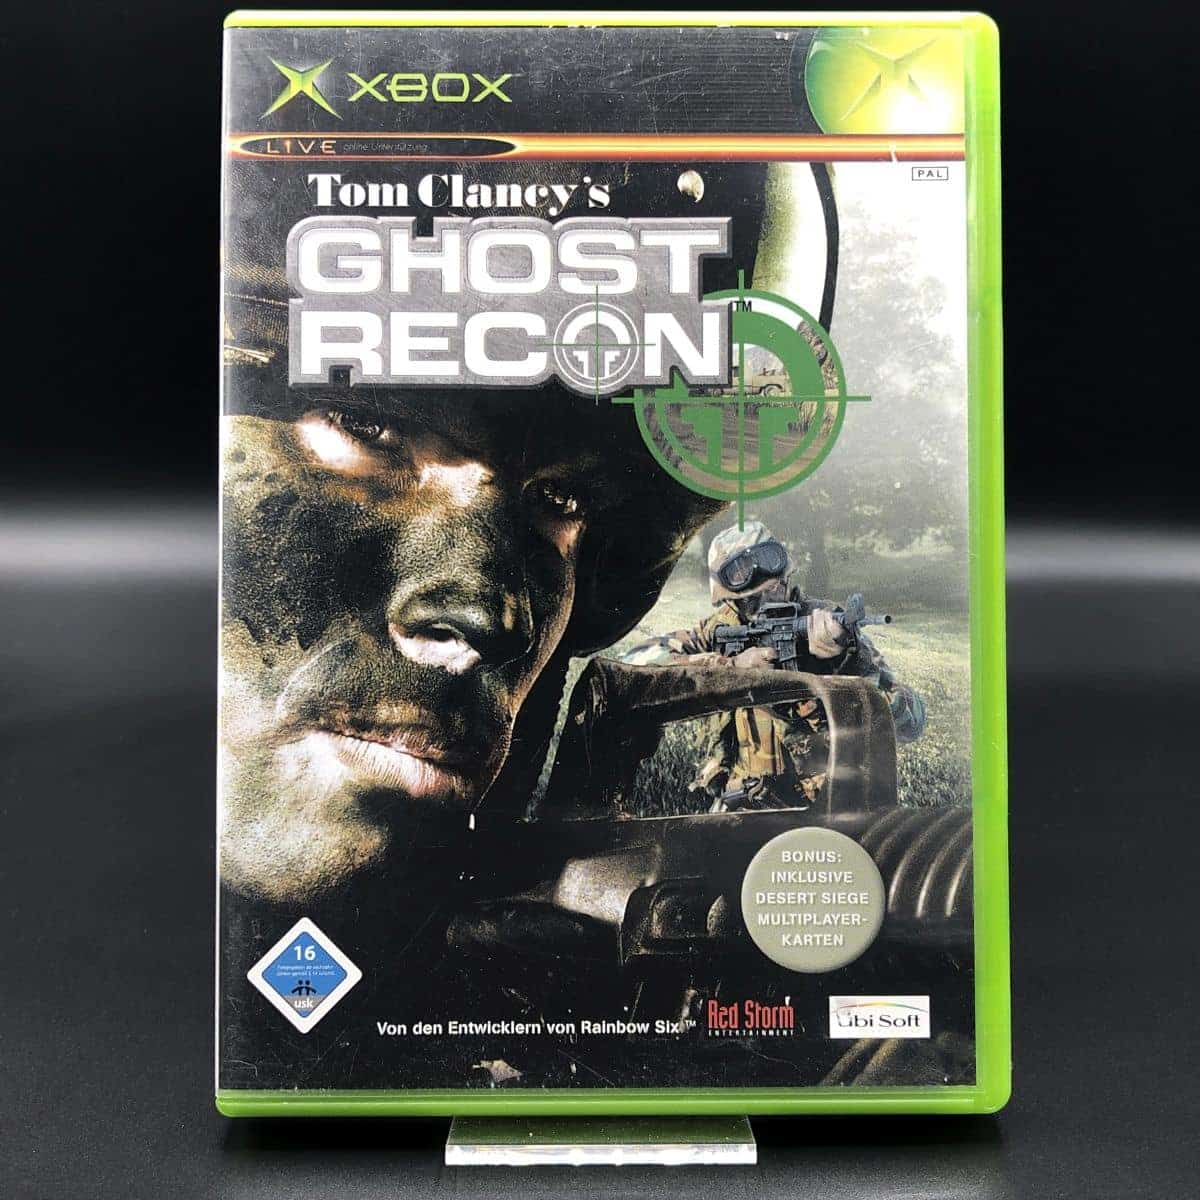 XBC Tom Clancy's Ghost Recon (Komplett) (Gebrauchsspuren) Microsoft Xbox Classic